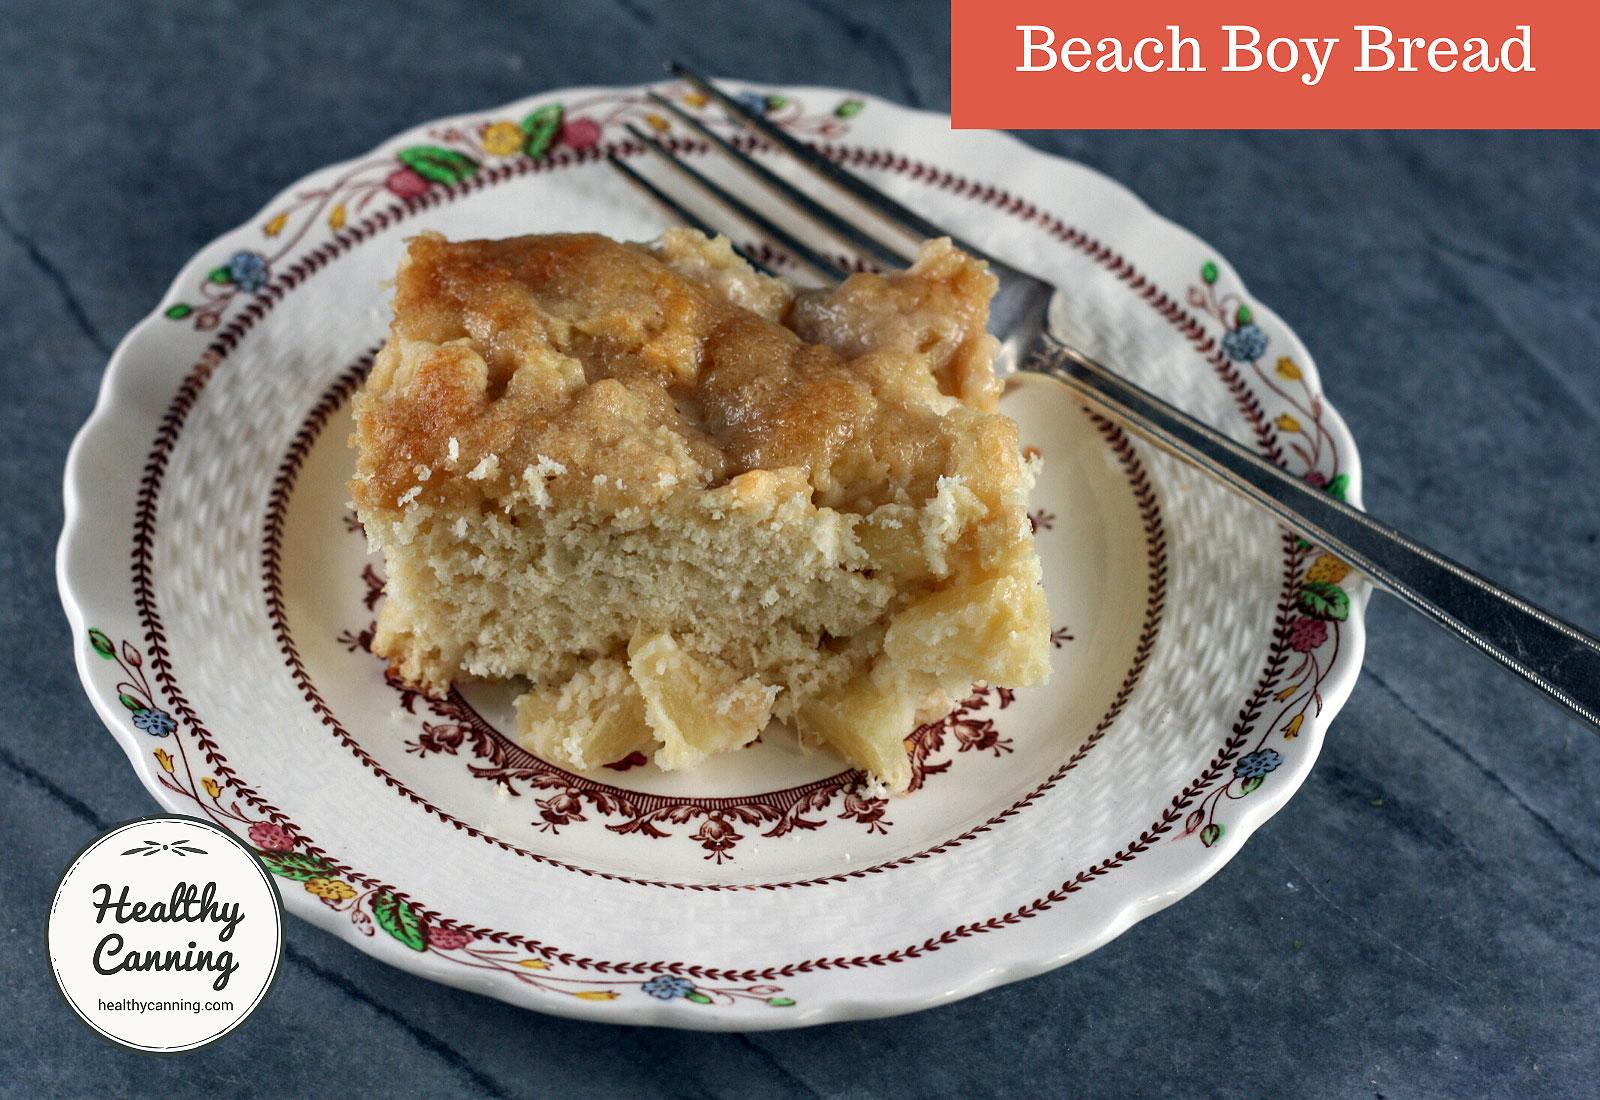 Beach Boy Bread